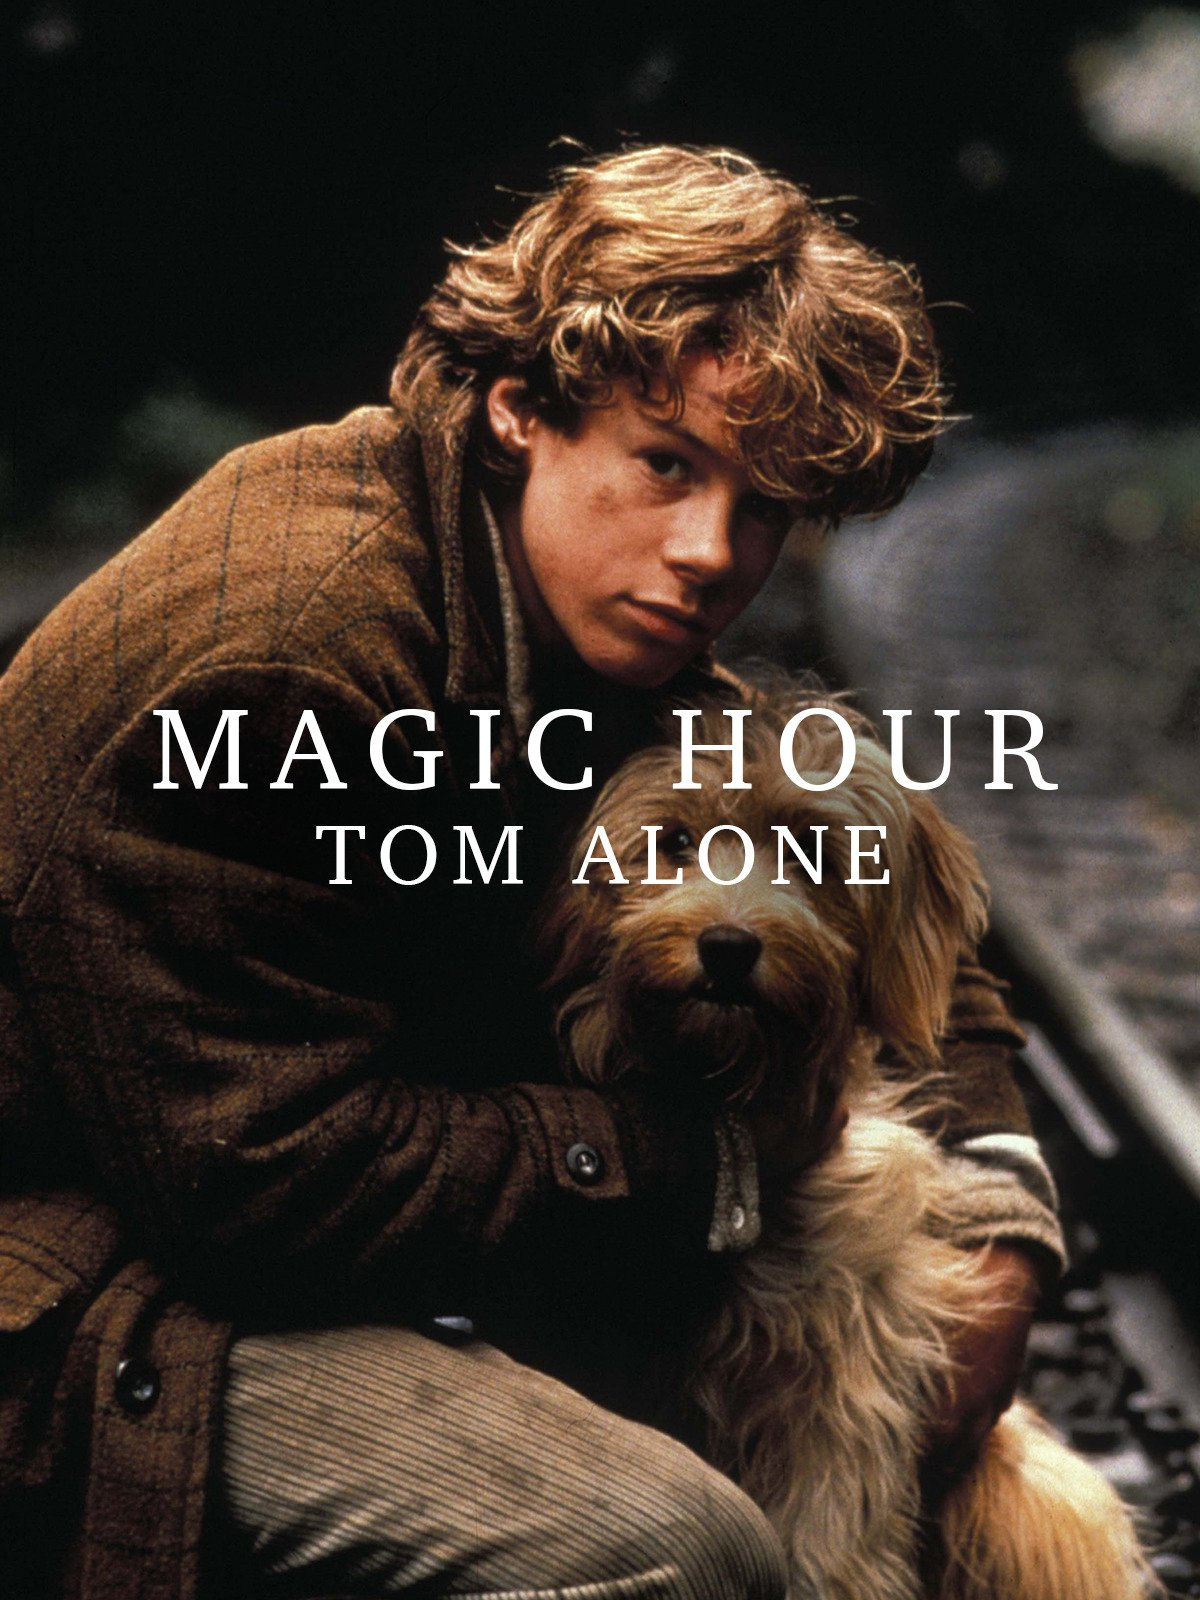 Magic Hour: Tom Alone